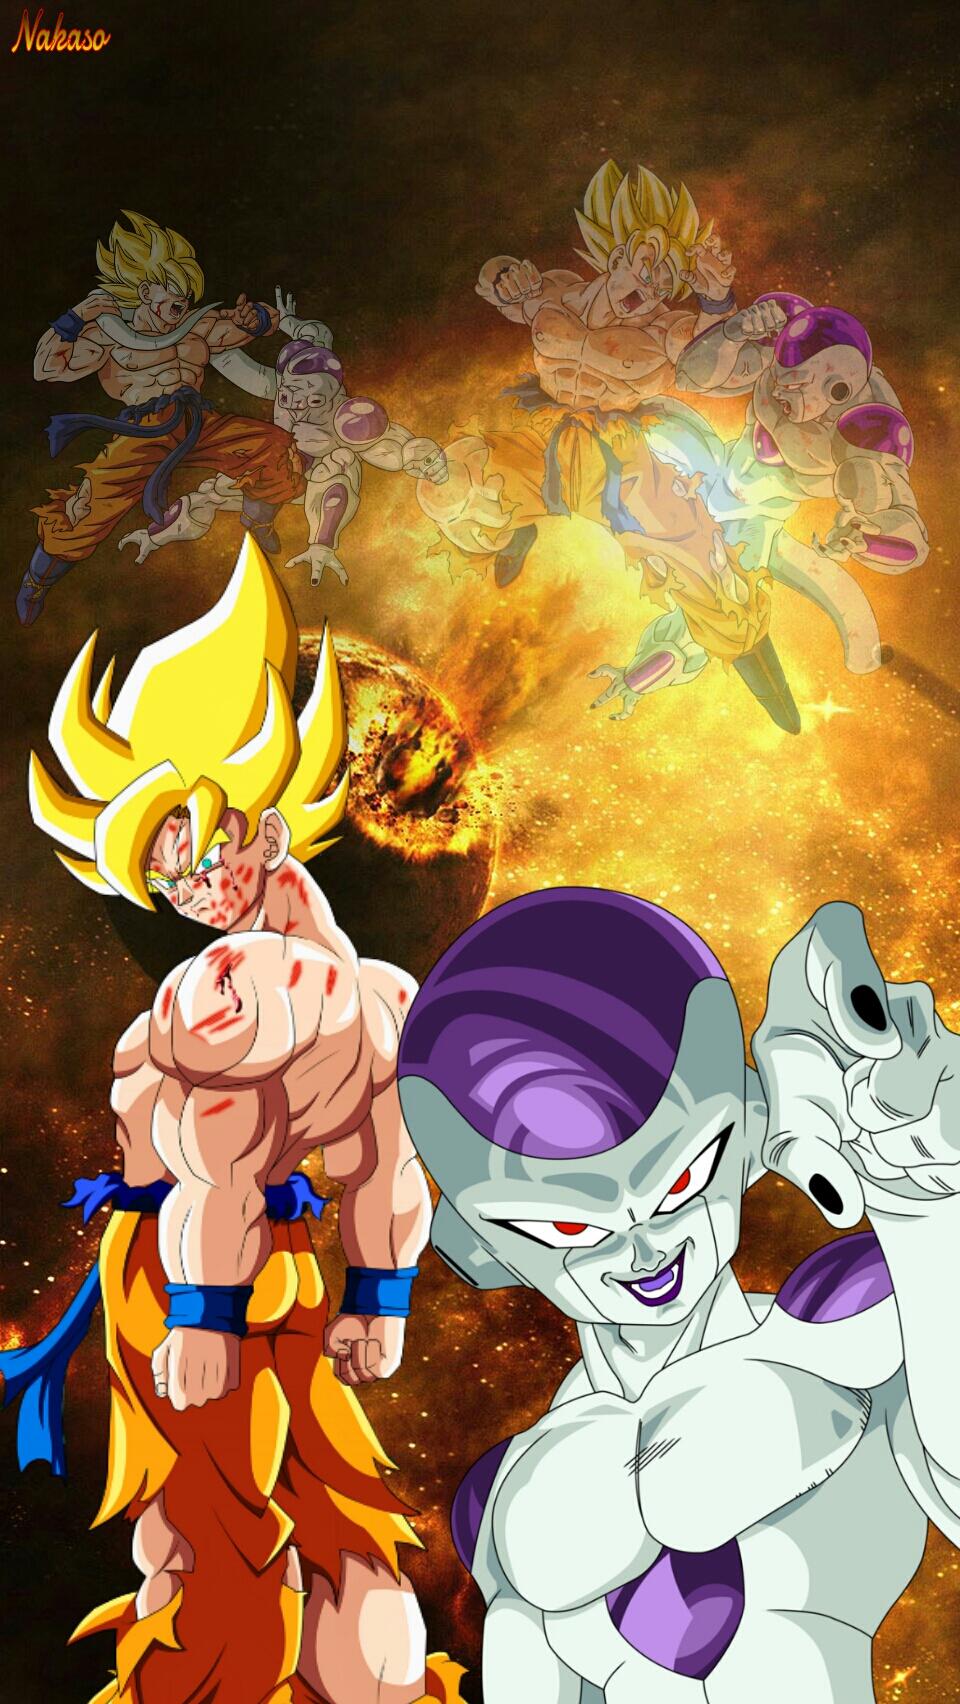 Dbz Goku Vs Frieza Wallpaper By Nakaso On Deviantart